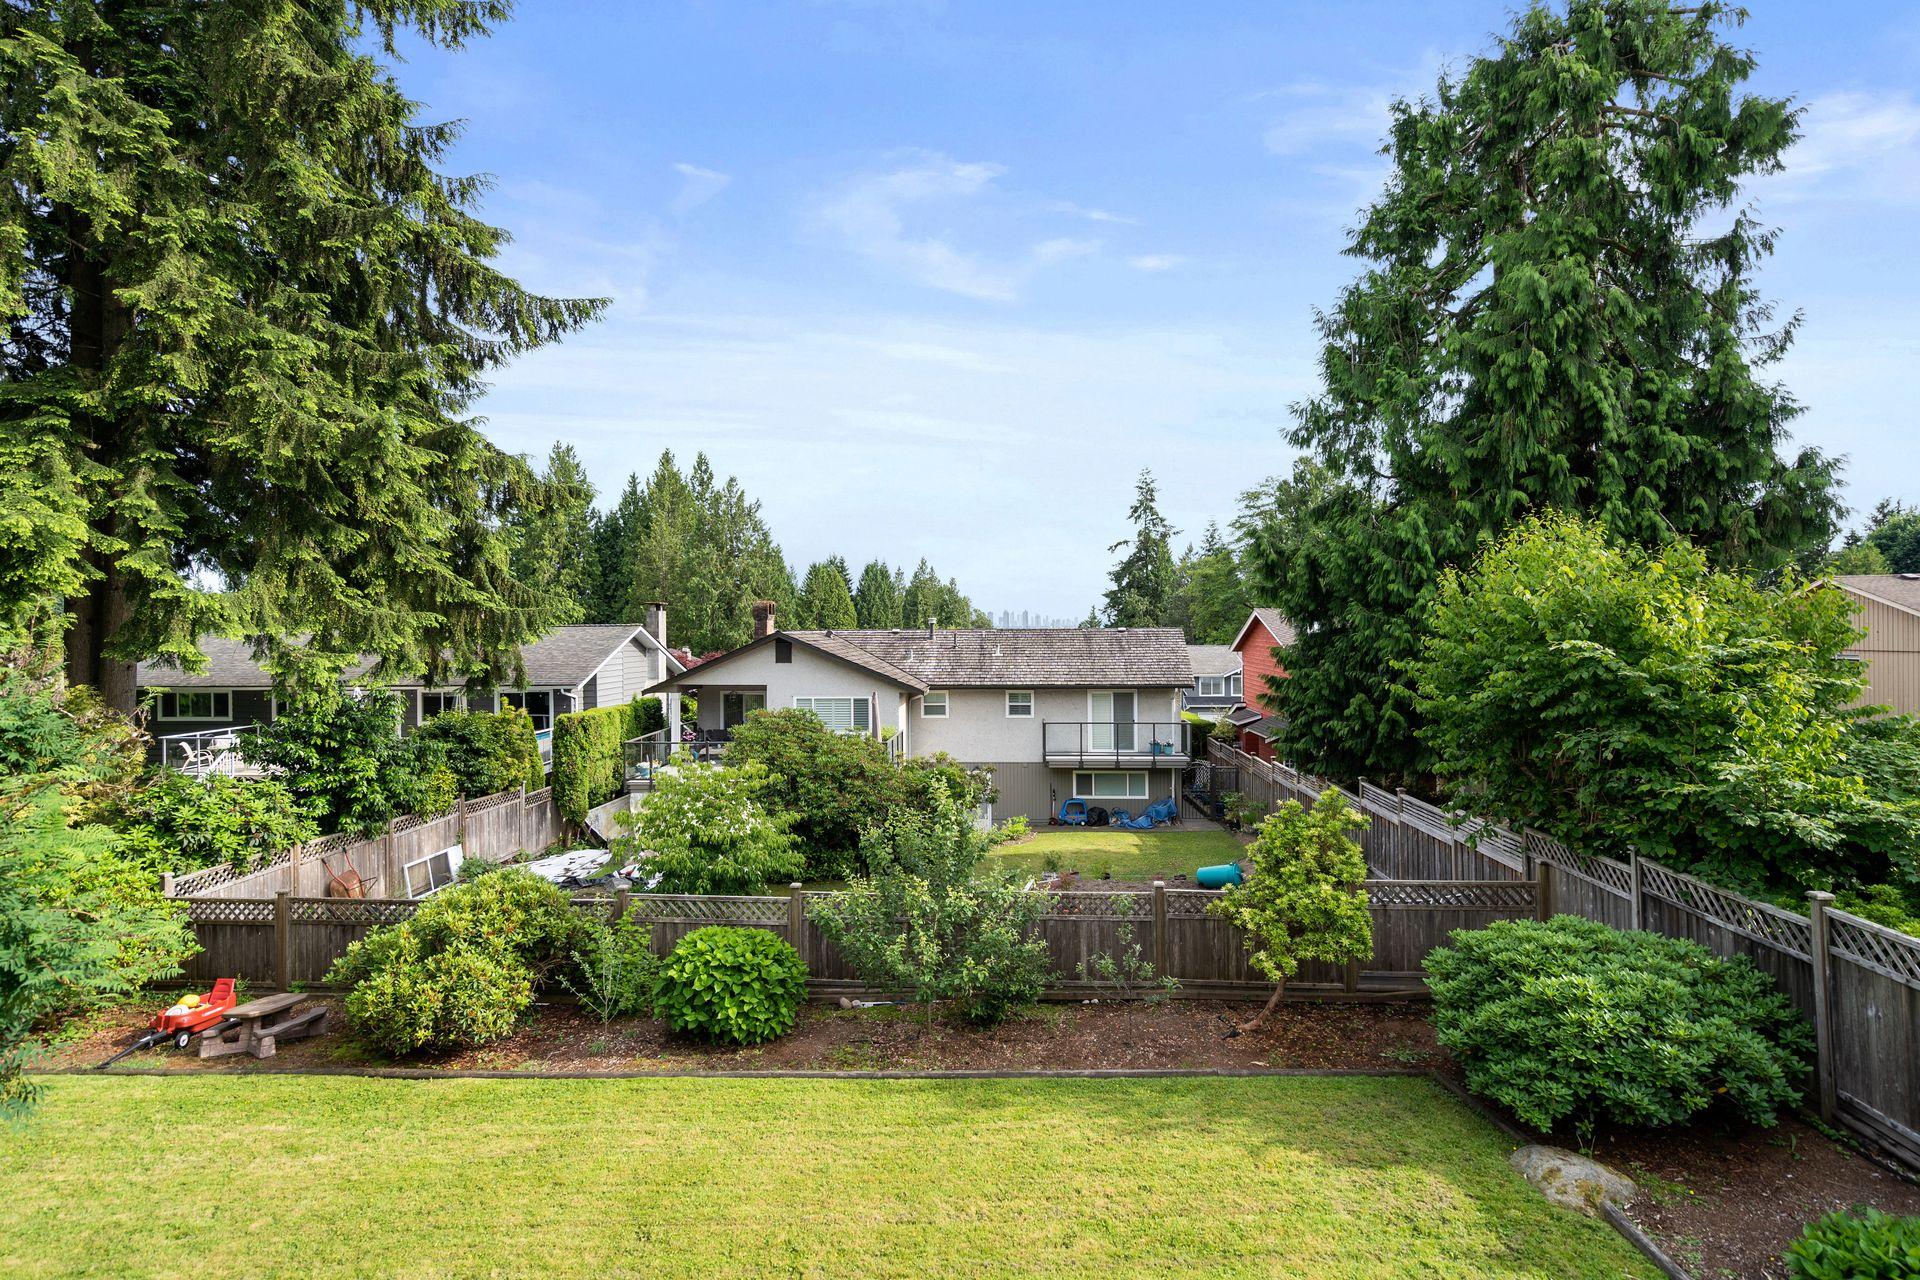 2673-byron-rd-north-vancouver-32 at 2673 Byron Road, Blueridge NV, North Vancouver